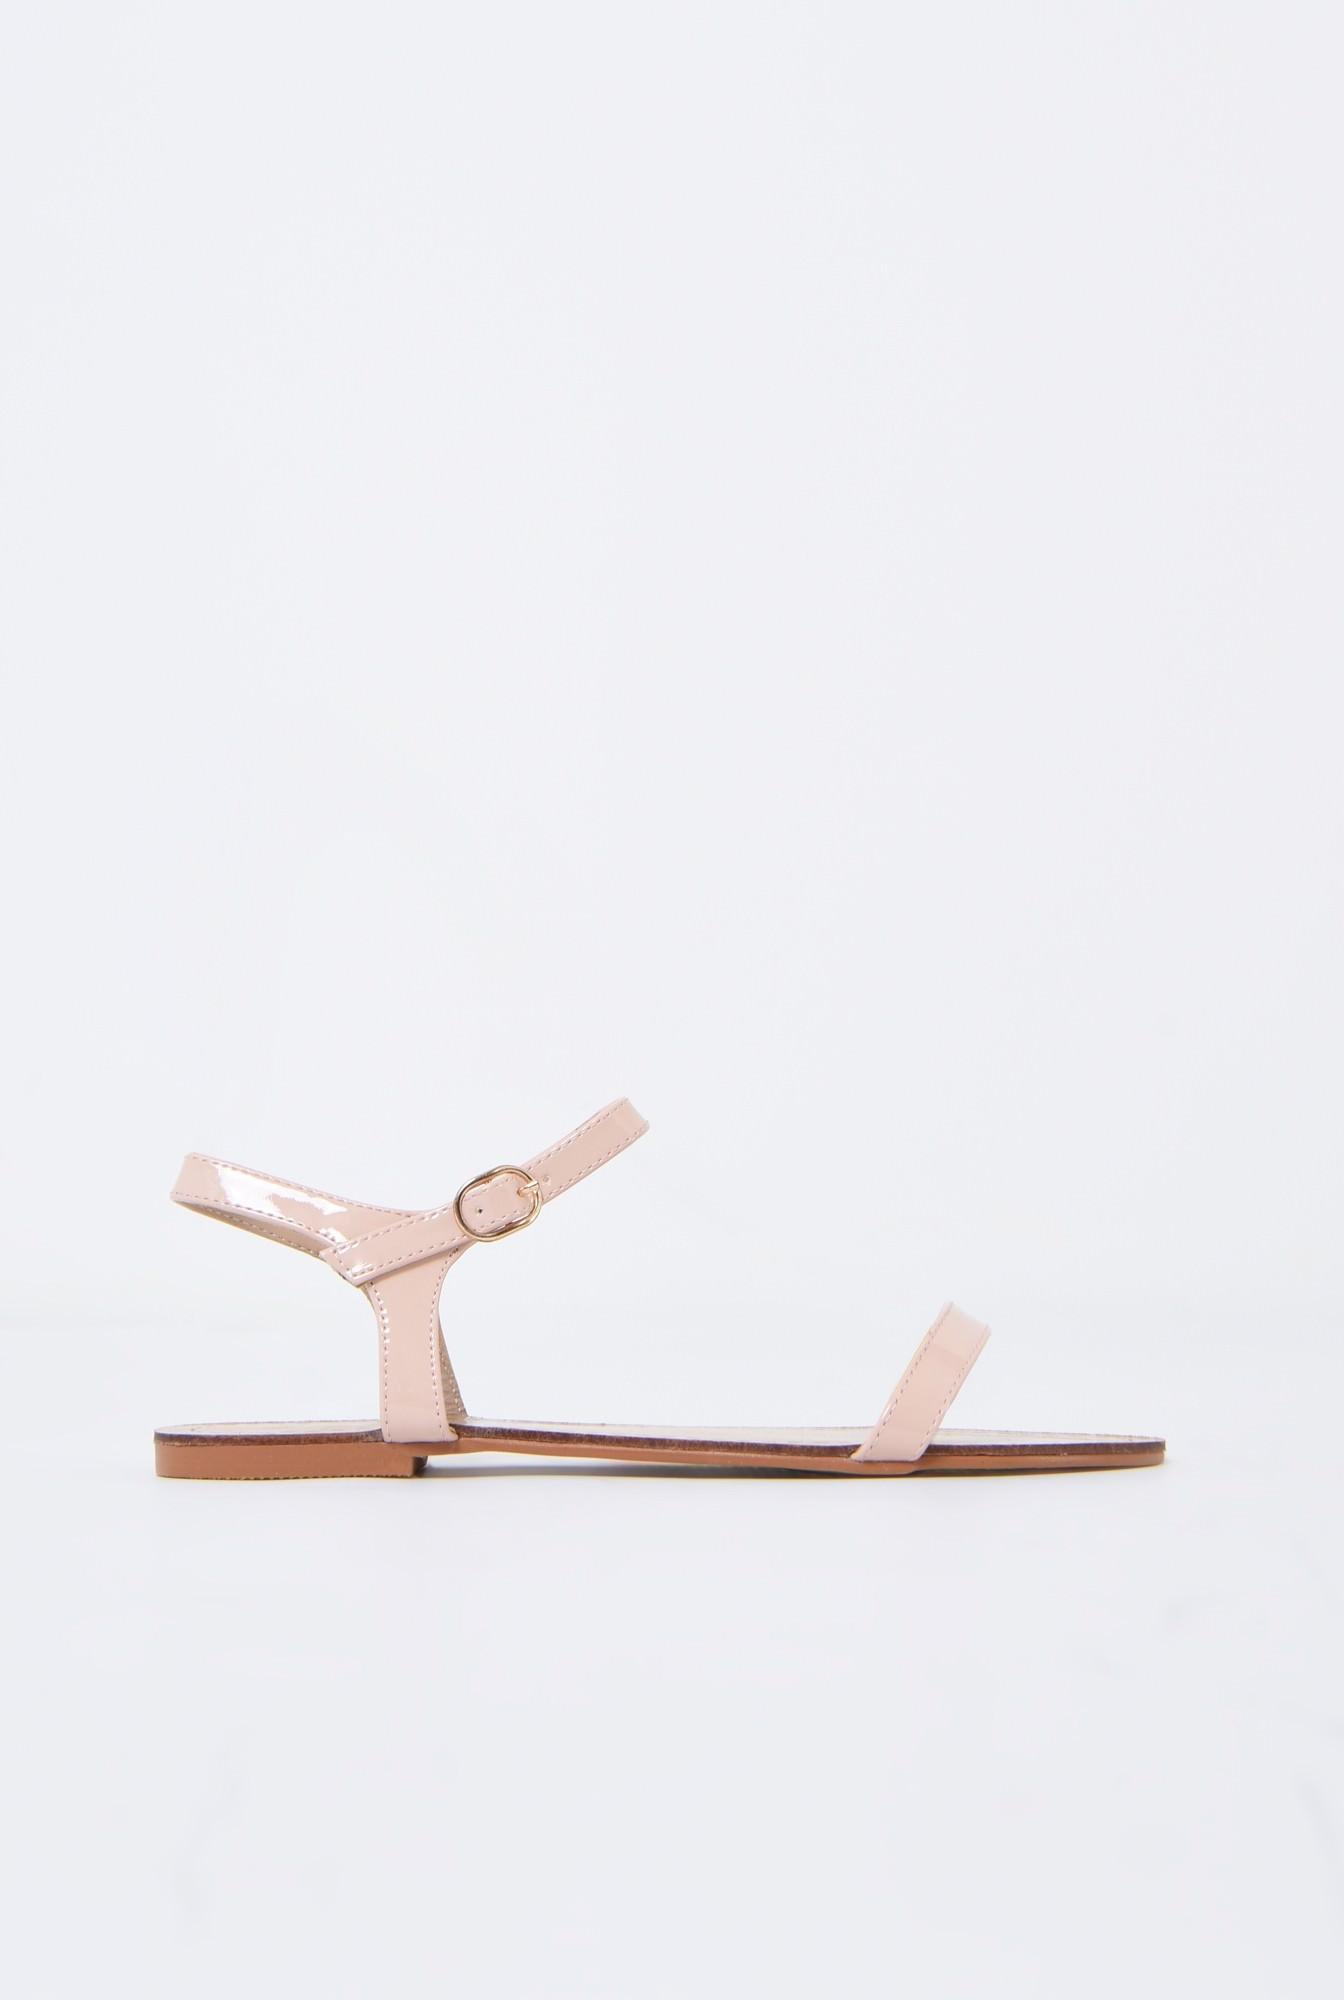 sandale din lac, crem, minimaliste, talpa joasa